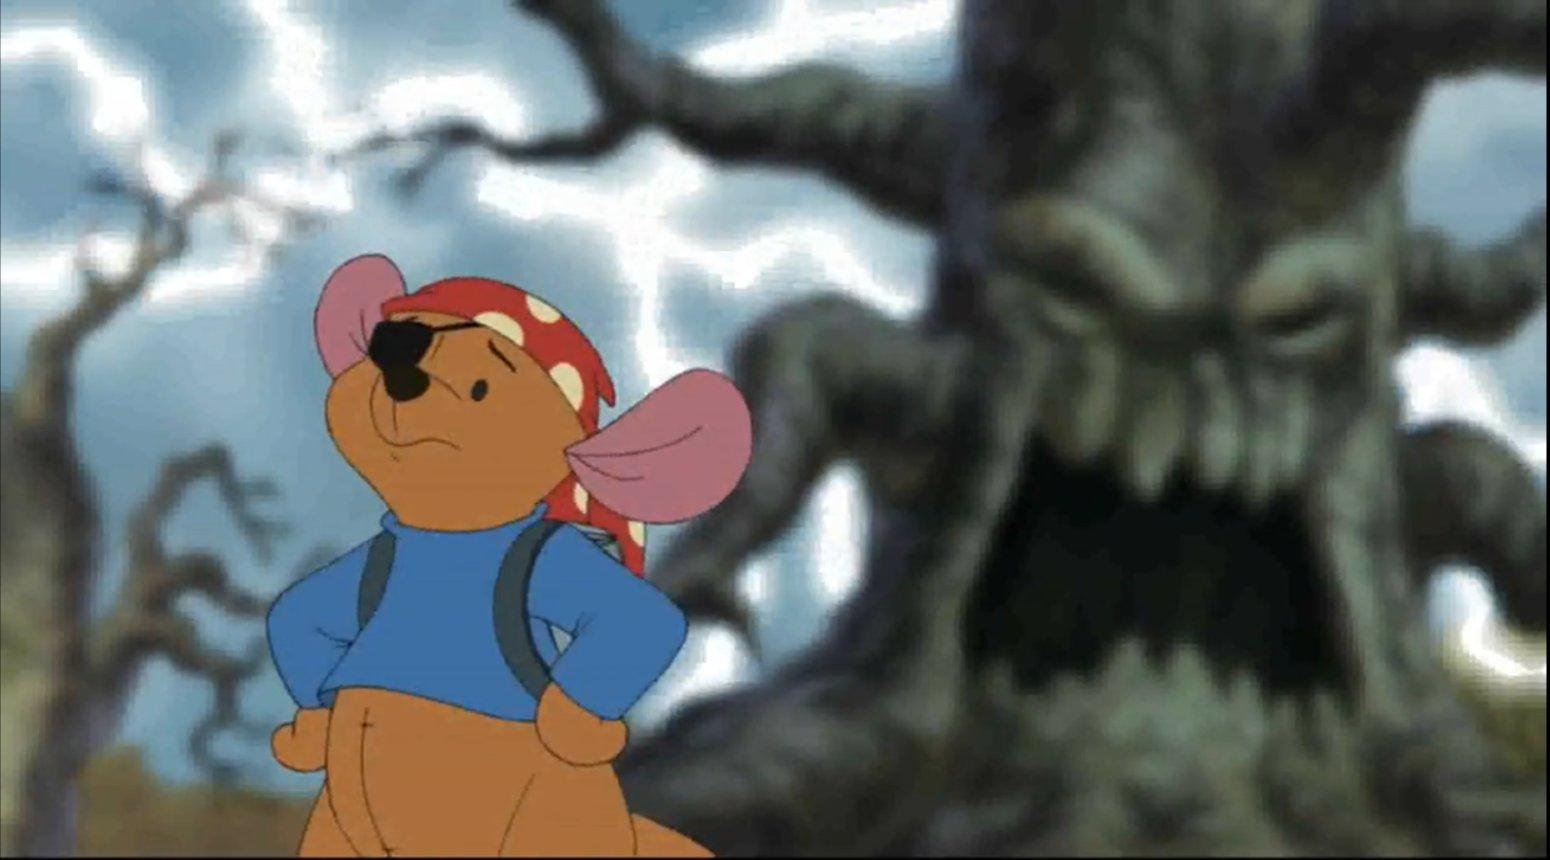 family friendly halloween movie countdown - Winnie The Pooh Heffalump Halloween